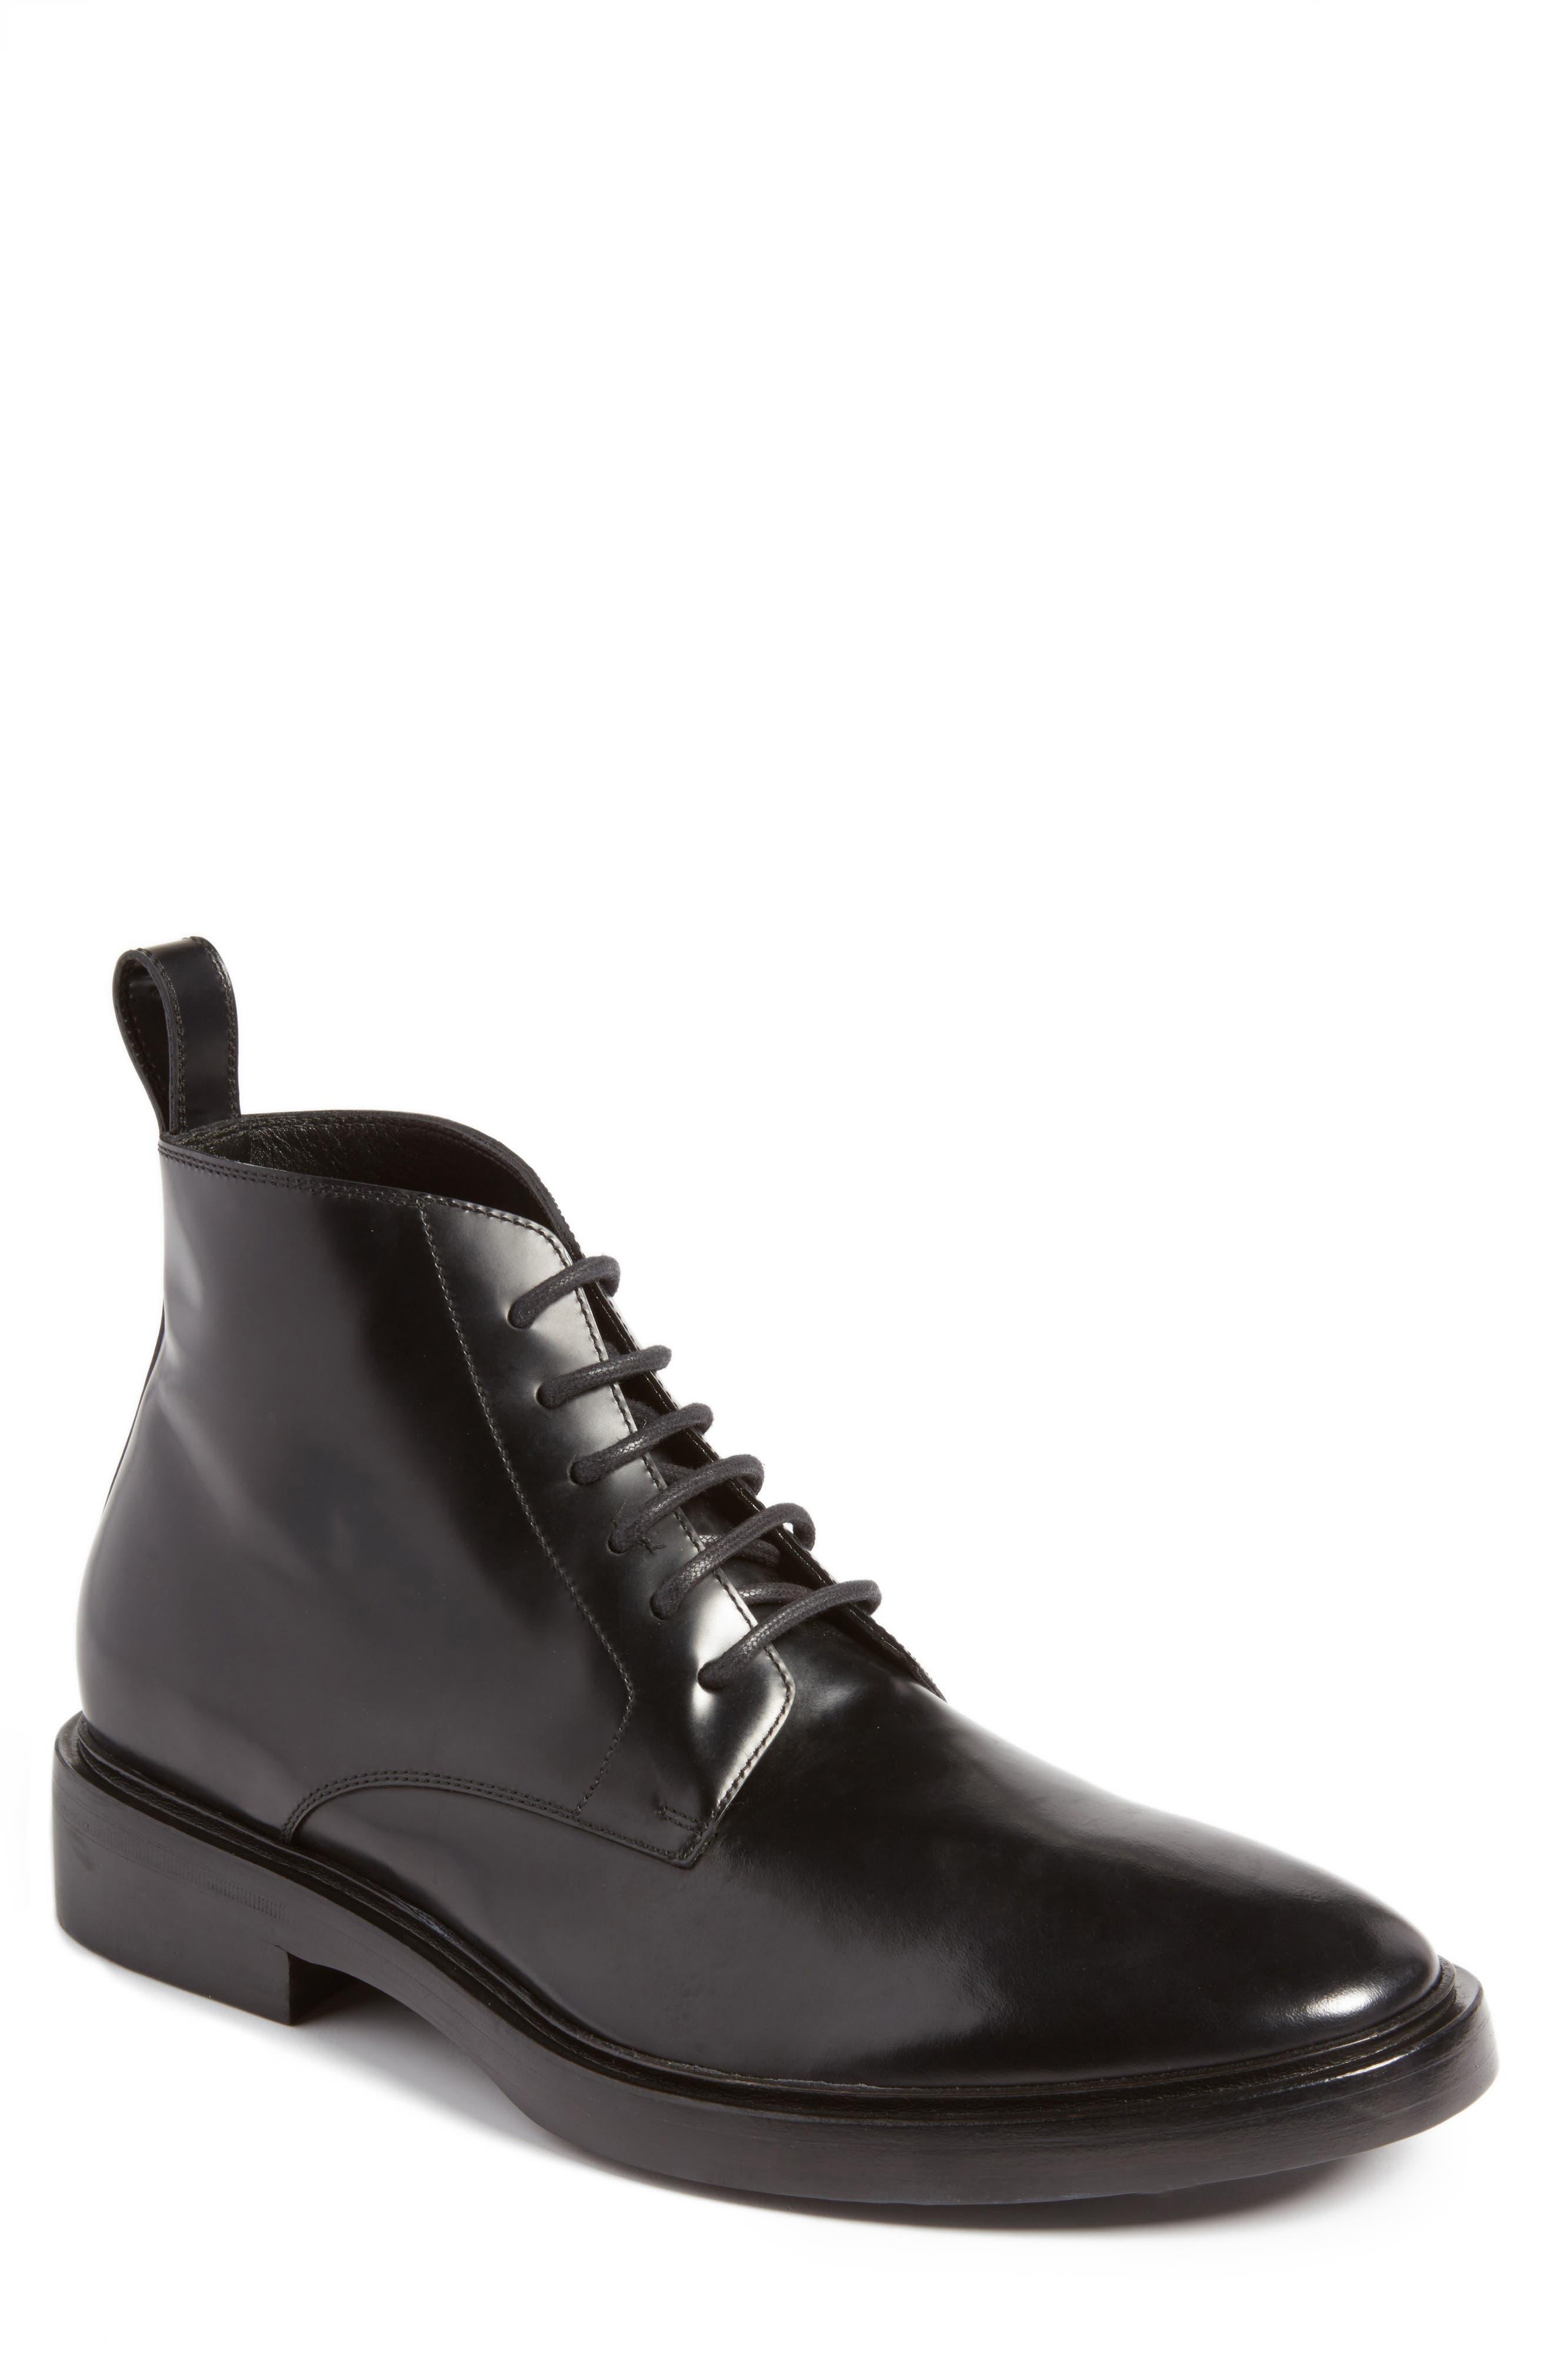 BALENCIAGA Plain Toe Boot